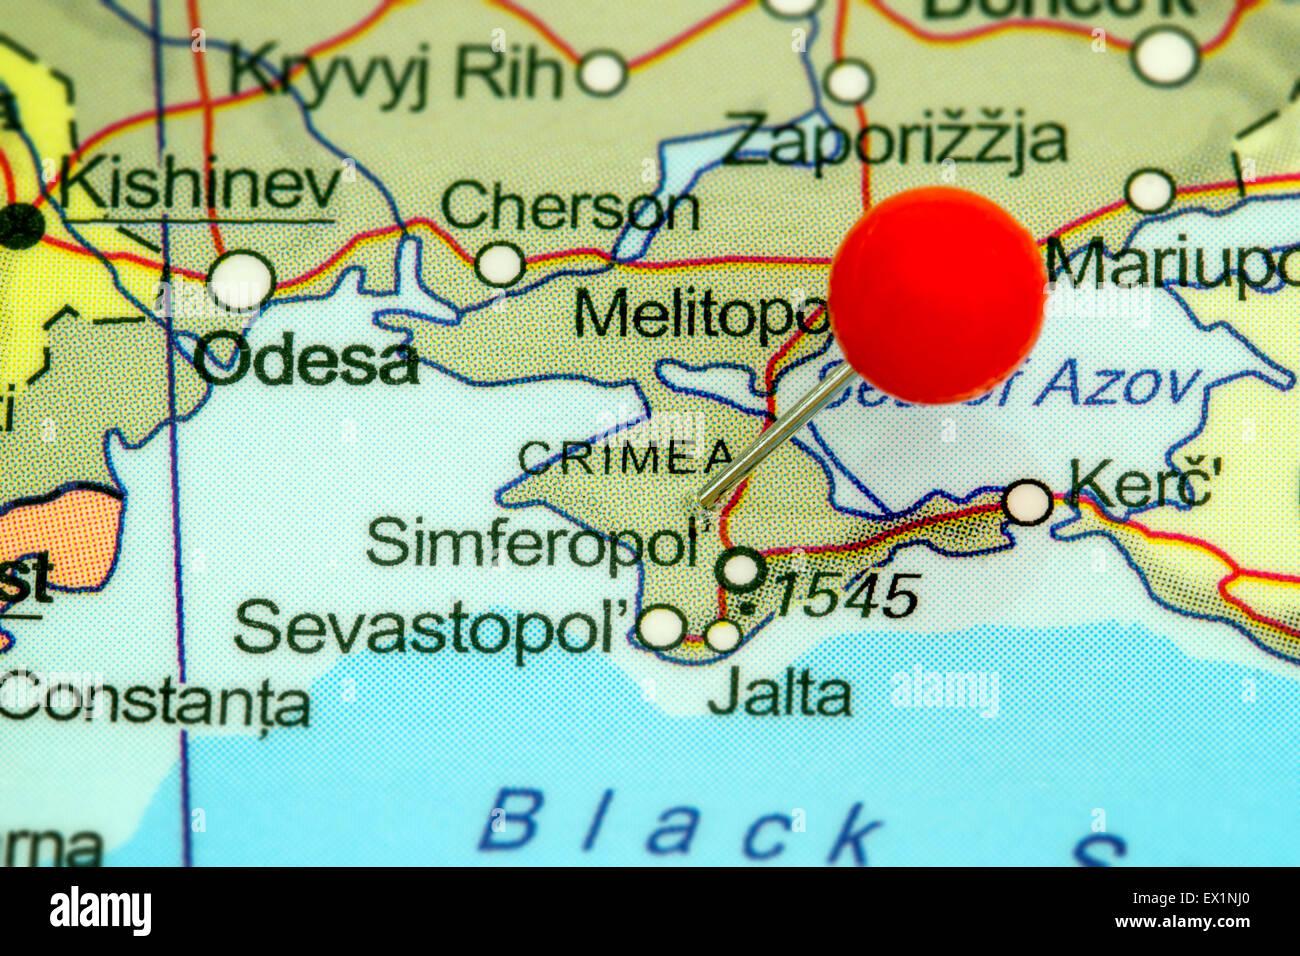 Map Of Crimea Stock Photos & Map Of Crimea Stock Images - Alamy